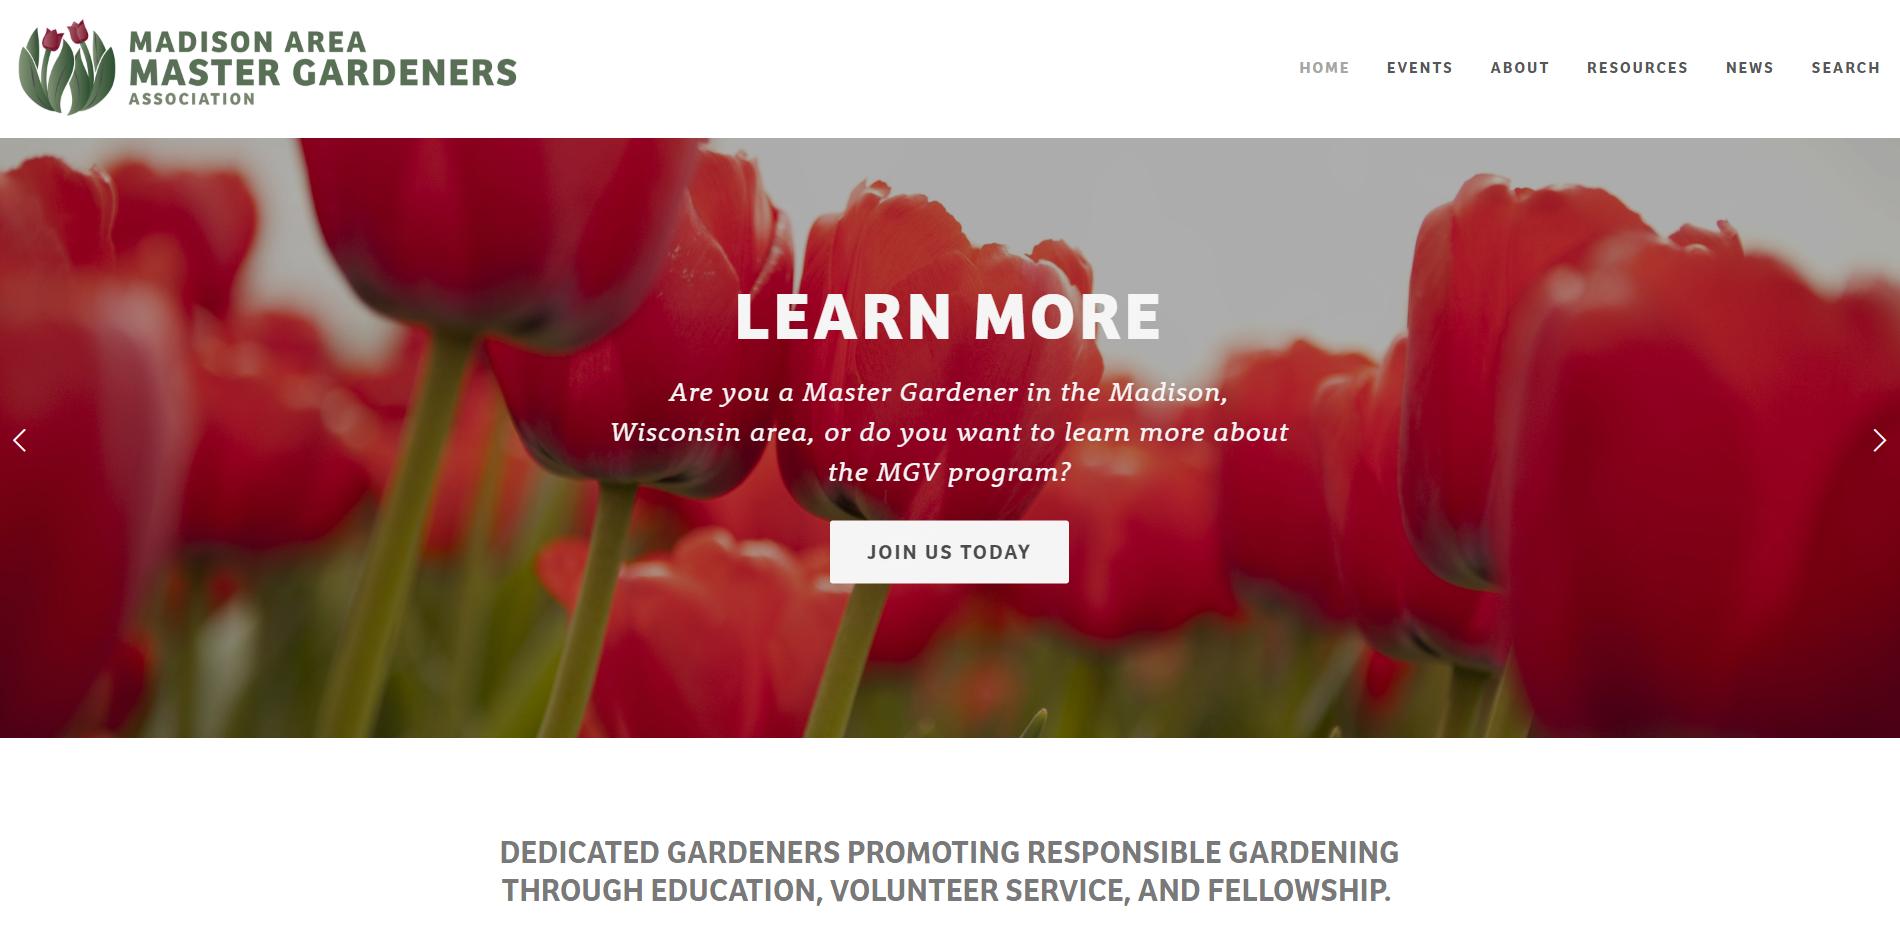 Madison Area Master Gardeners Association